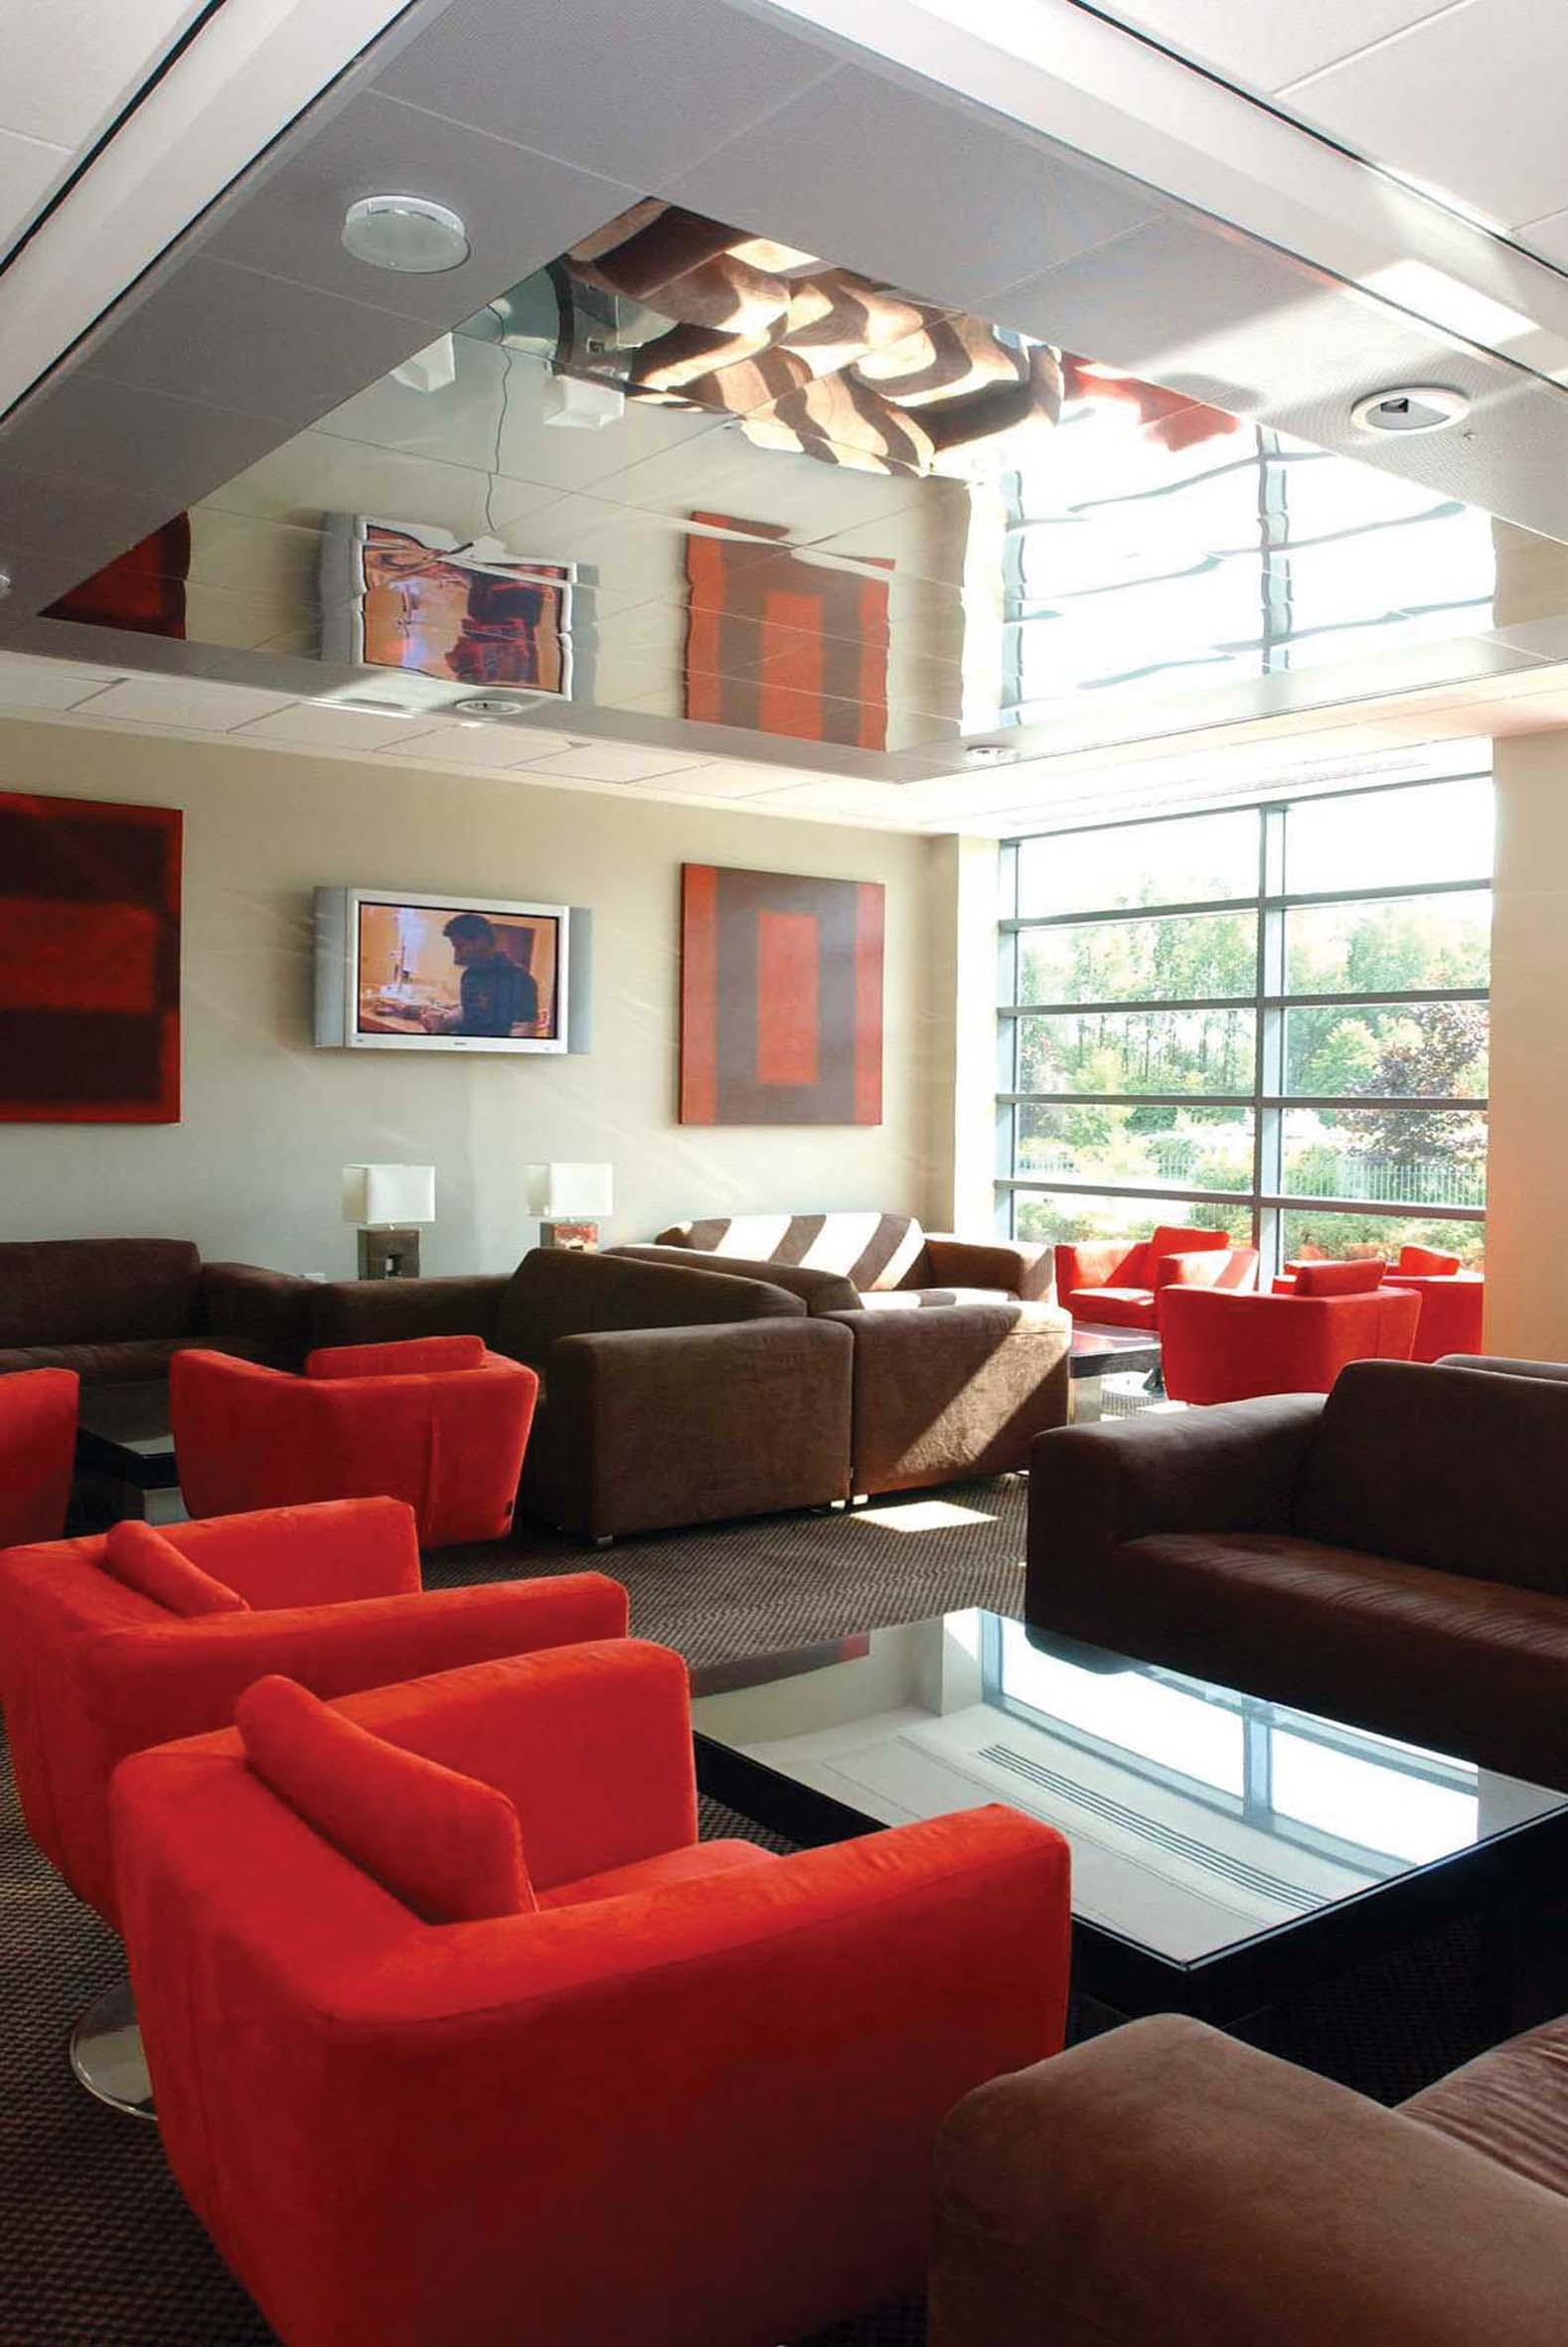 International Hotel Telford Twin Room